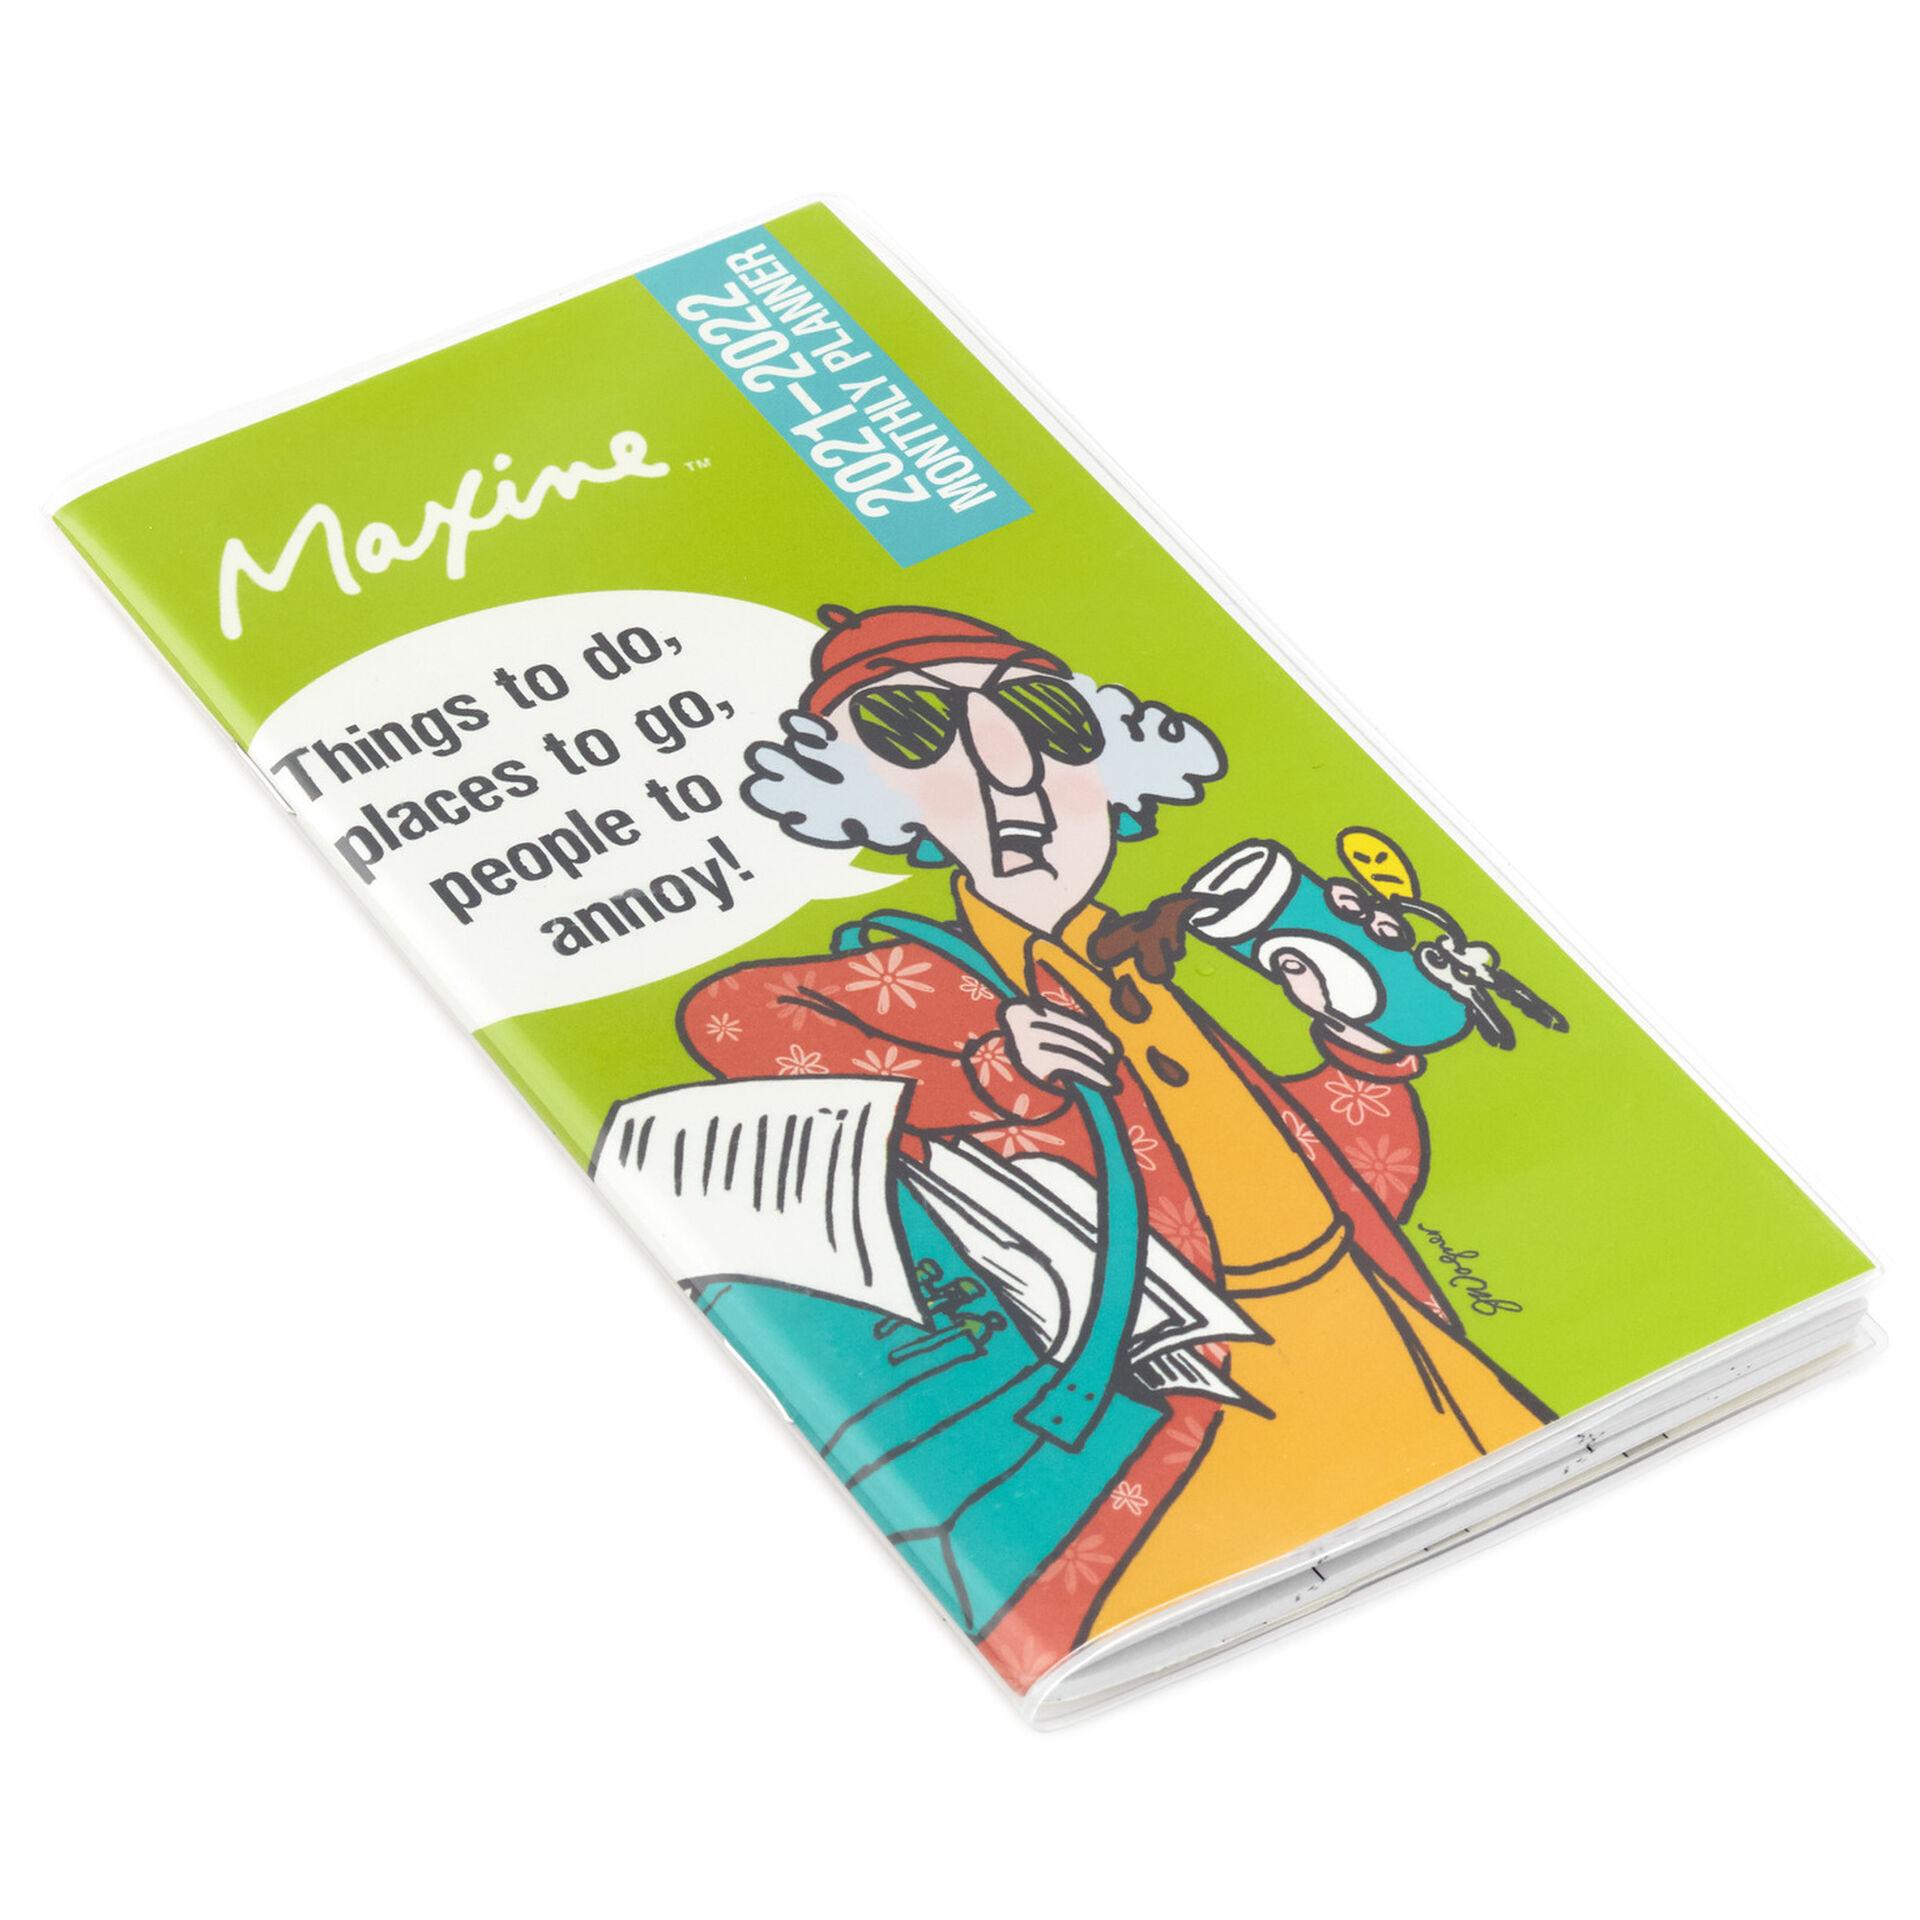 Maxine Calendar 2022.Office Products Maxine Daily 2021 Calendar Office Supplies